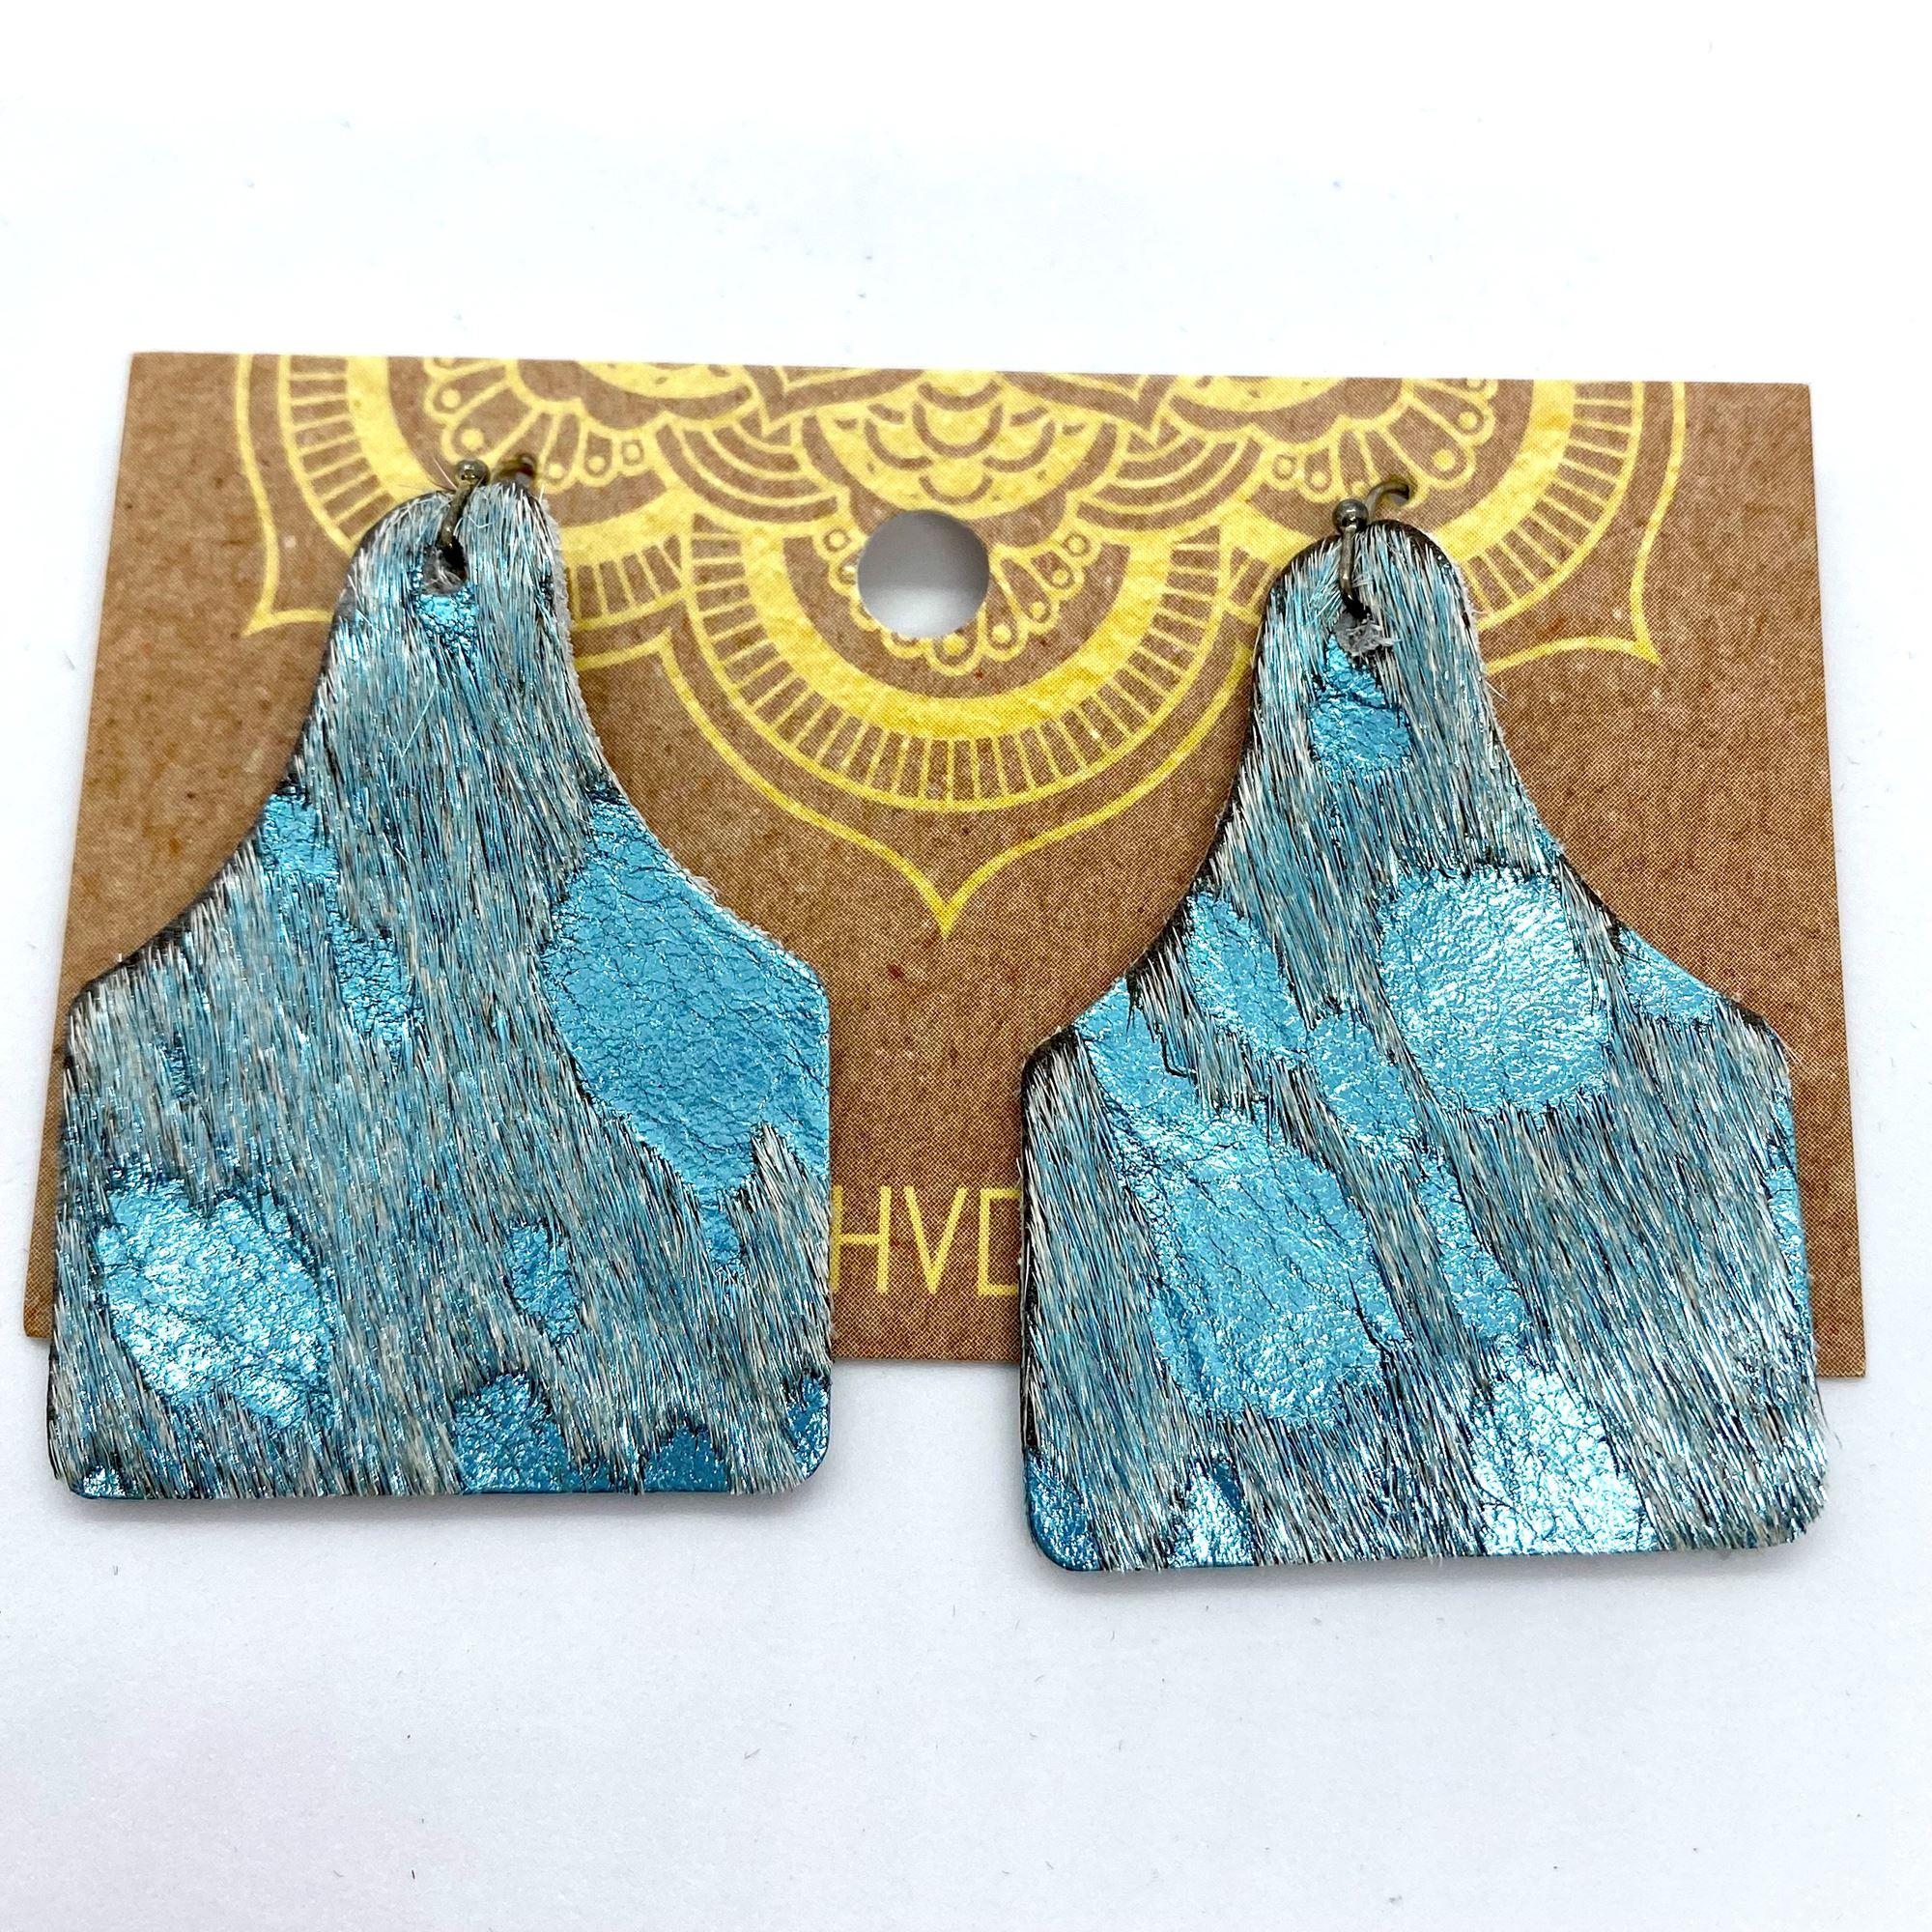 Turquoise & Foil Hair-On-Hide Tag Earrings (2)